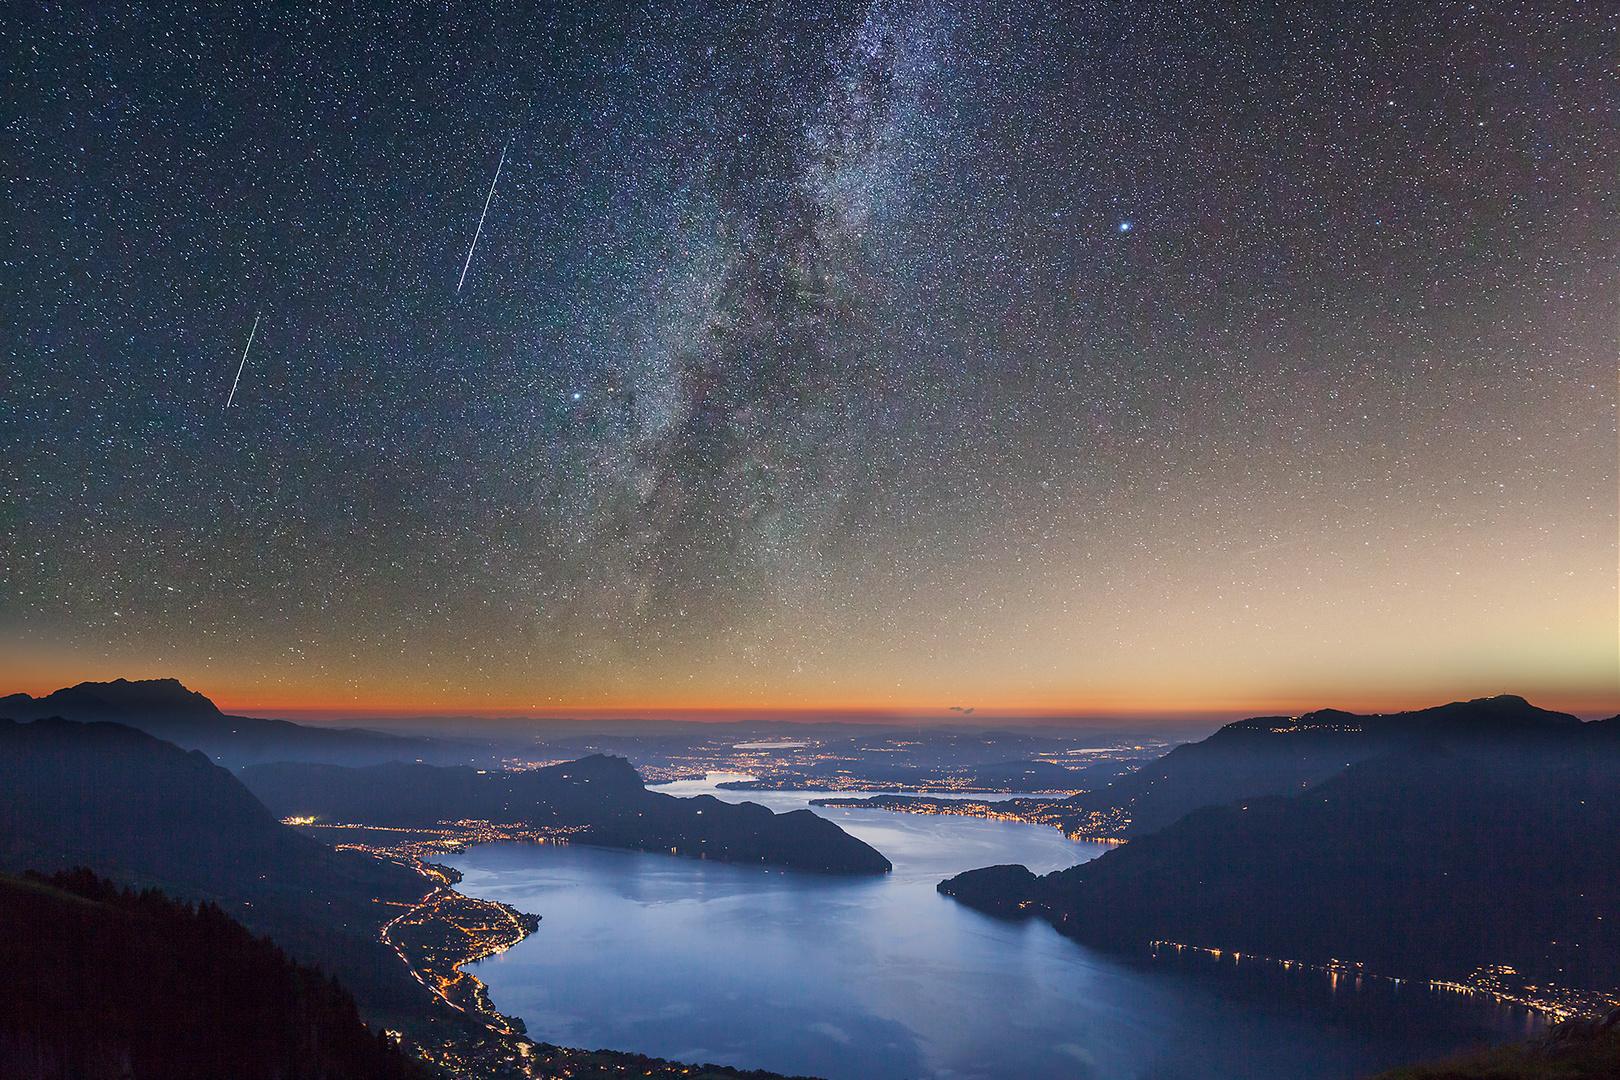 Shooting Stars over Lake Lucerne